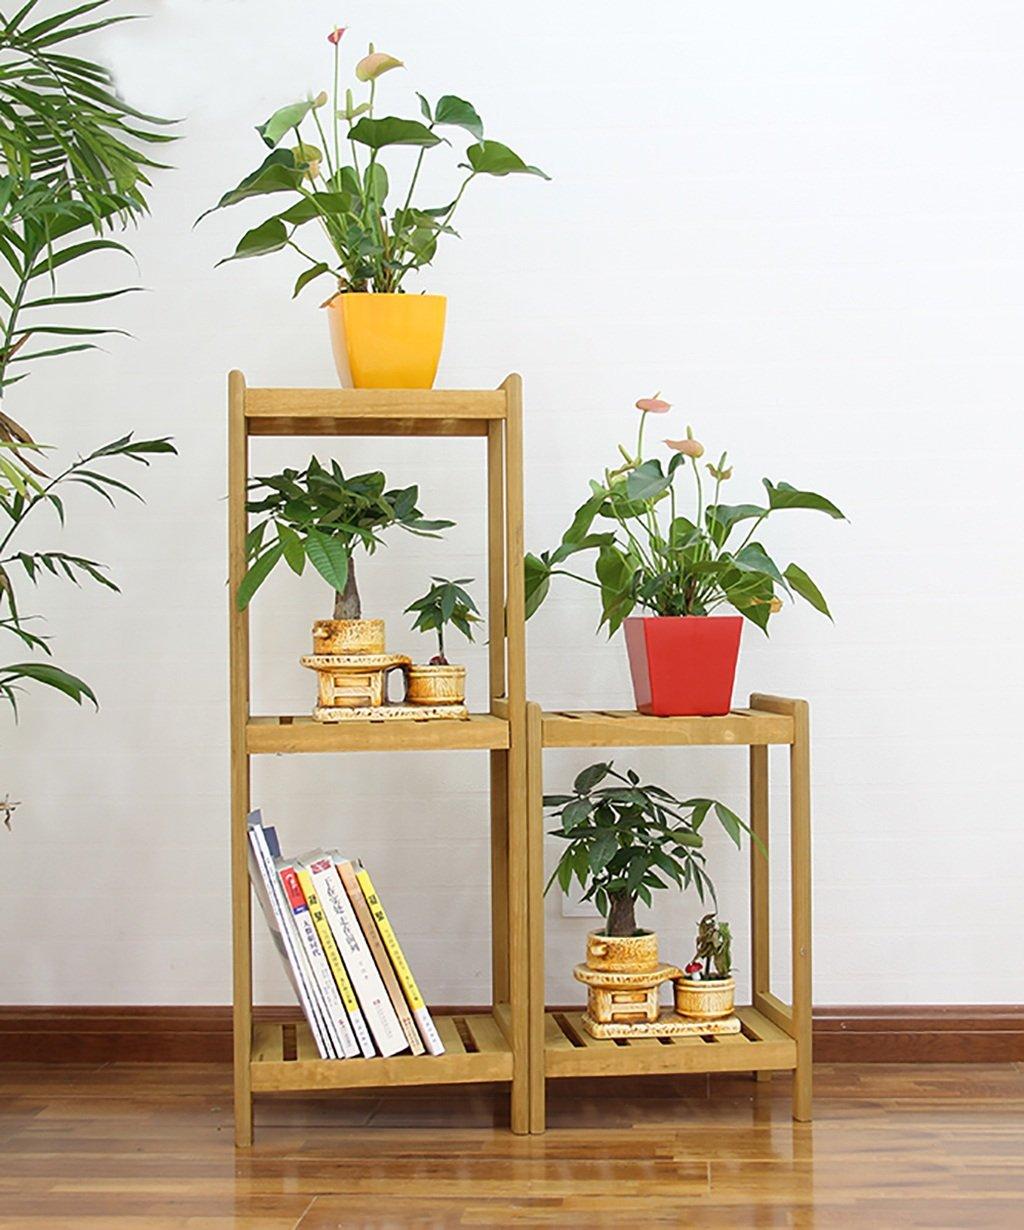 LB huajia ZHANWEI Massivholz-Blumen-Racks Moderne Einfachheit Anti-Korrosions-Blumentopf Rack Regal Holz Farbe